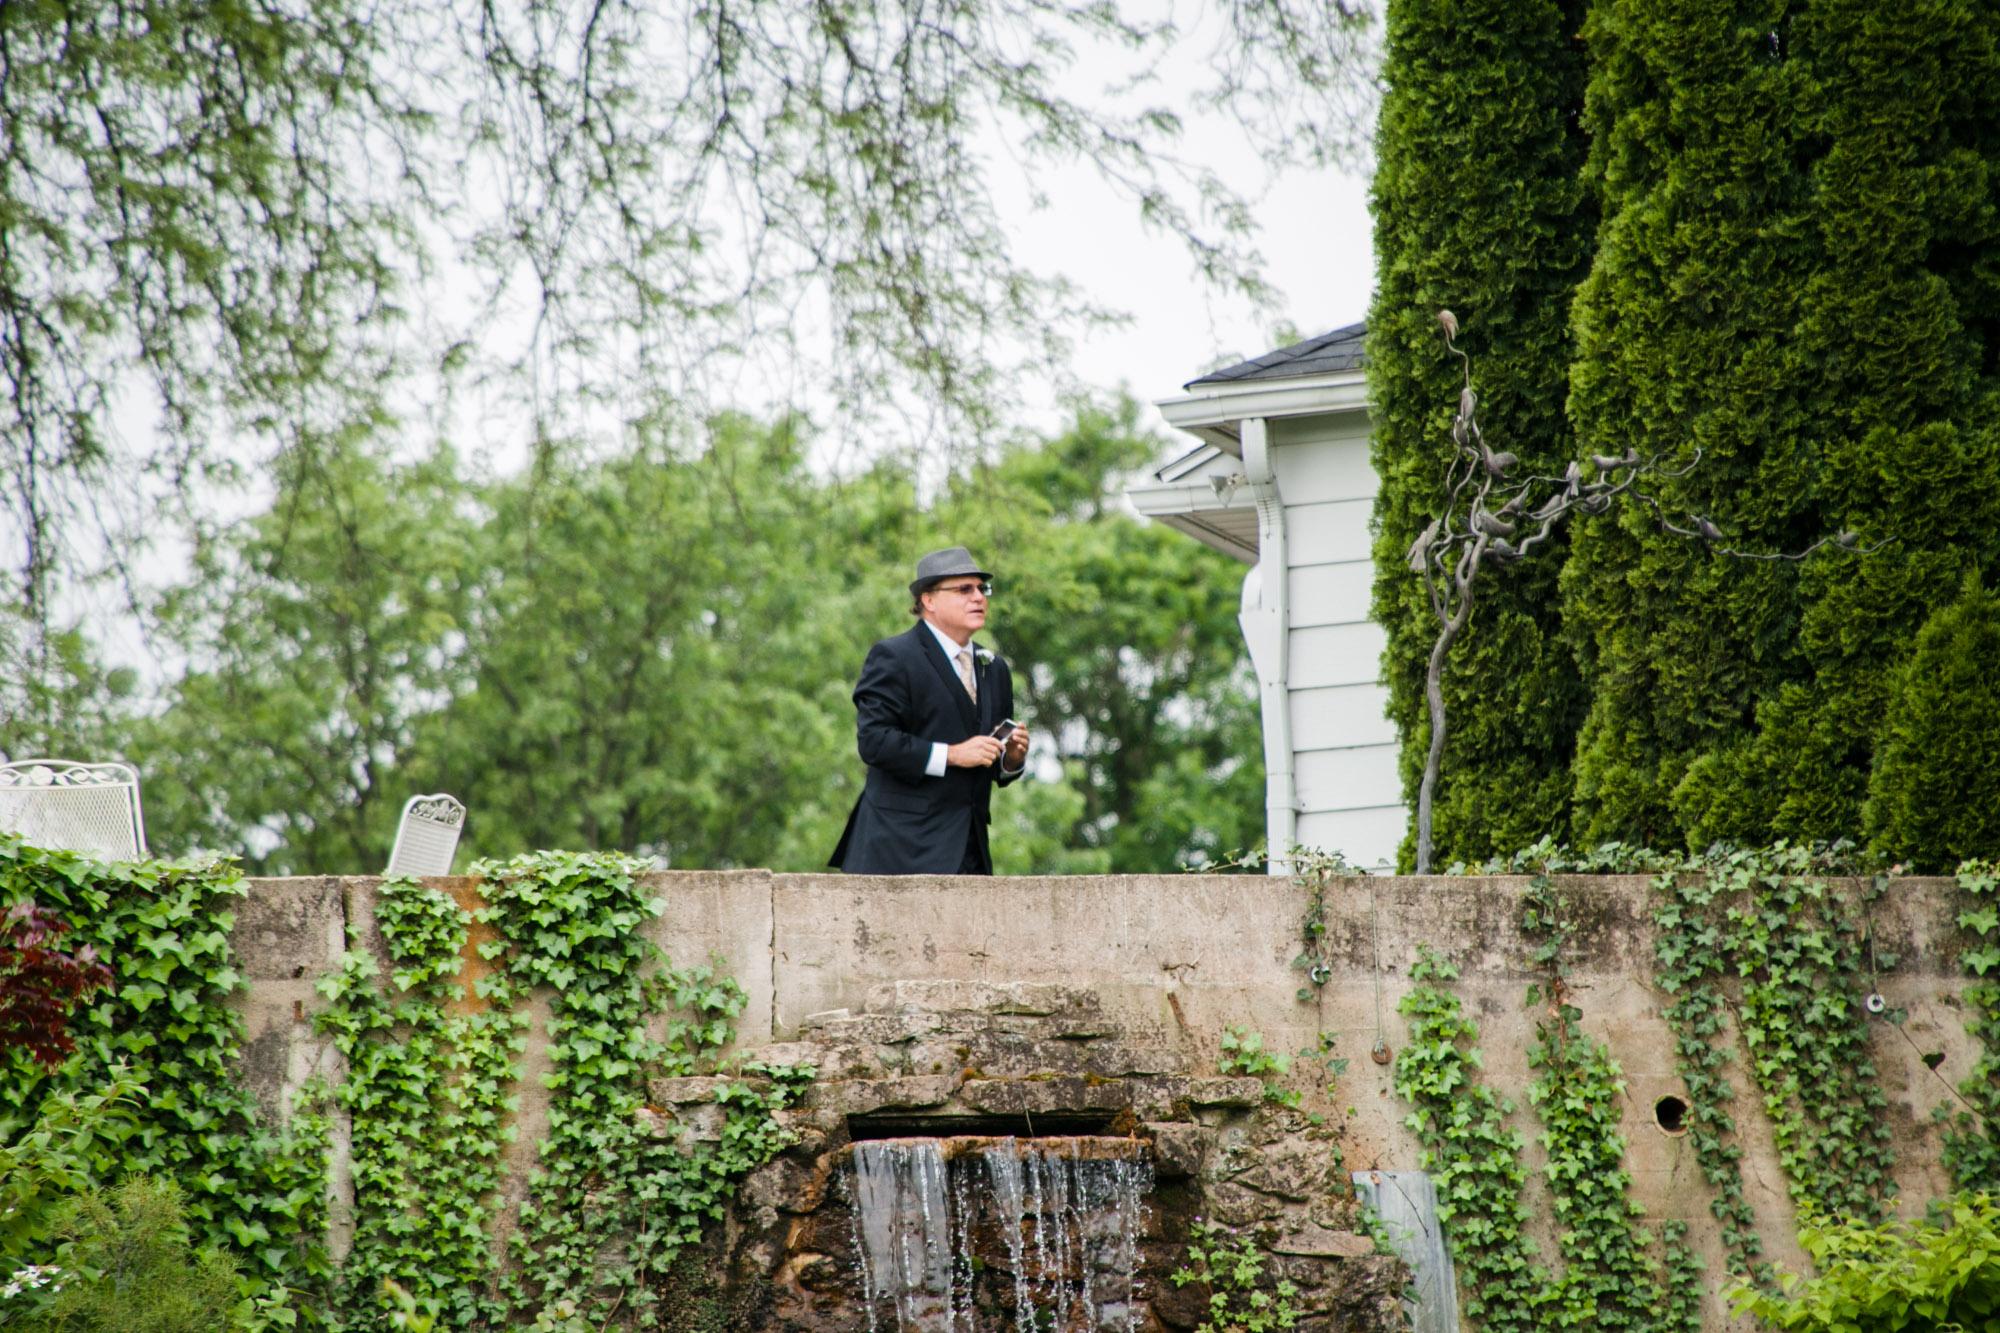 hensville-wedding-downtown-toledo-ohio (34 of 103).jpg